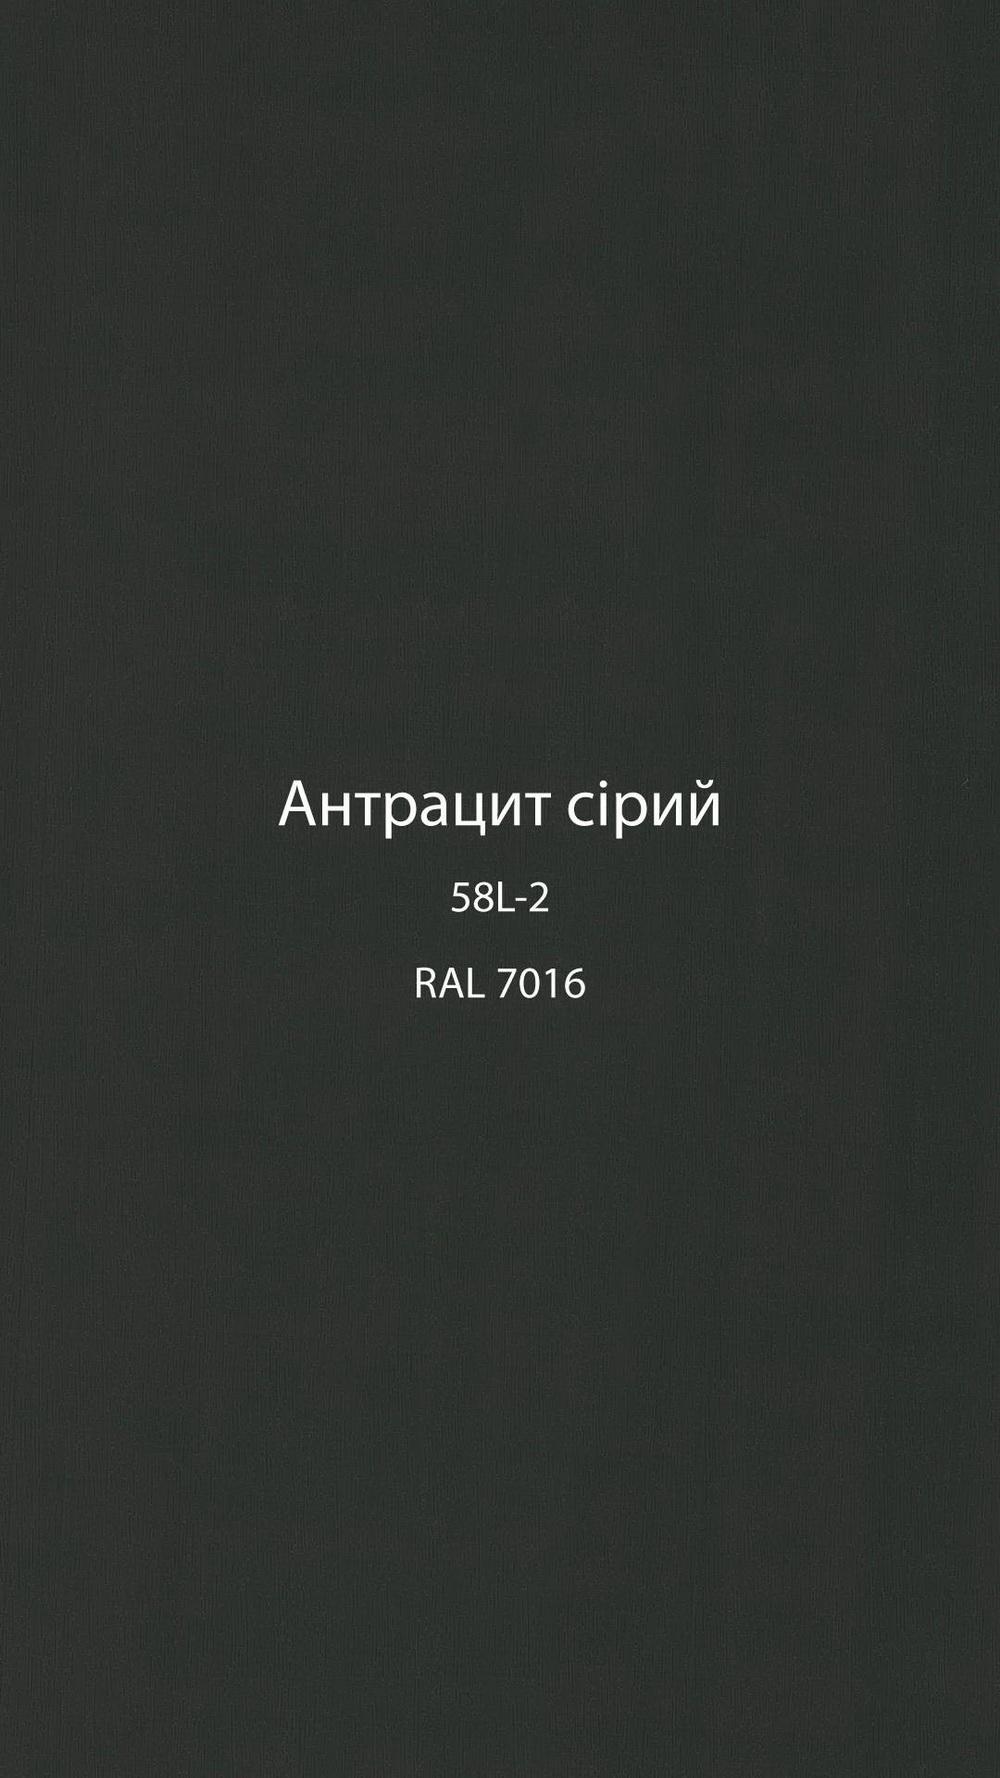 Антрацит сірий - колір ламінації профілів заводу EKIPAZH